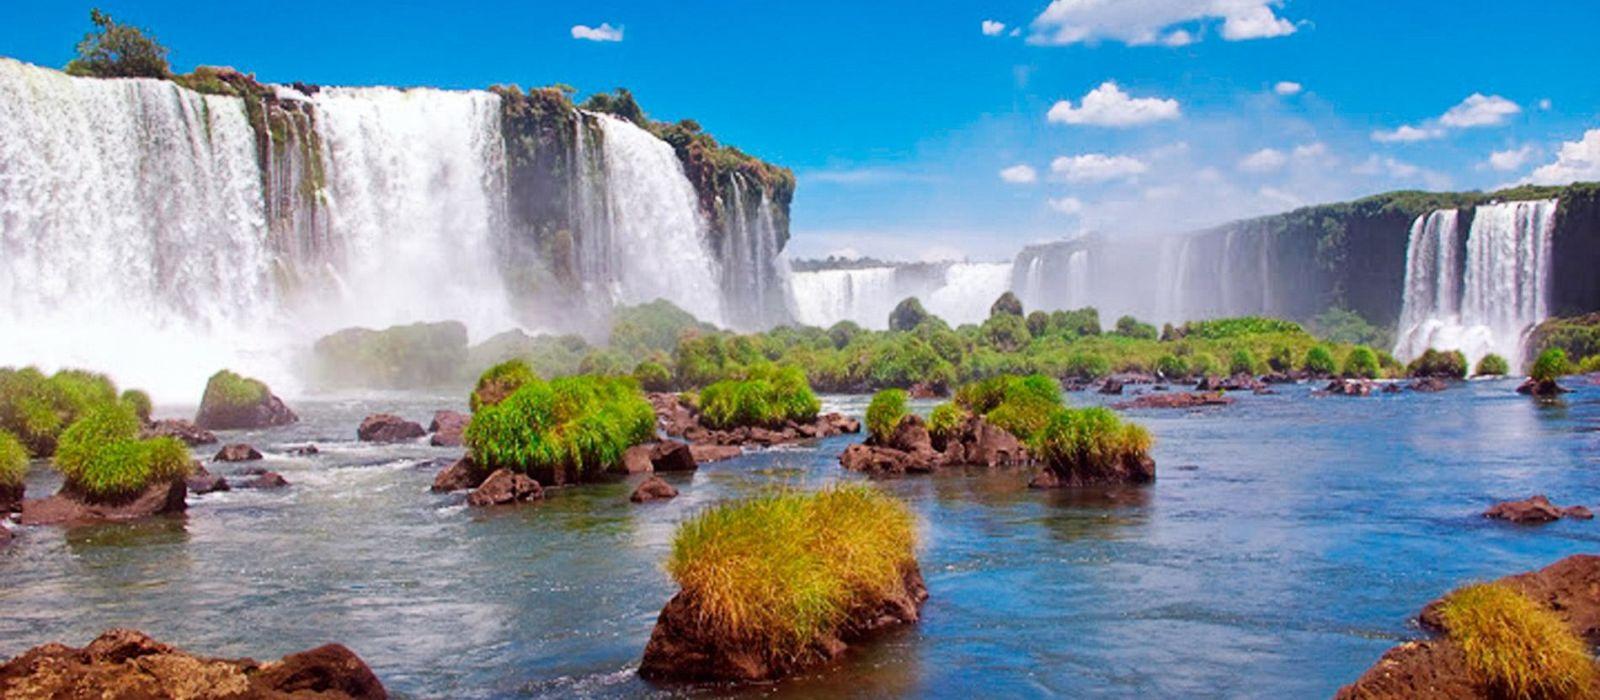 Iguazu Falls Brazil Wallpaper Exclusive Travel Tips For Your Destination Foz Do Iguacu